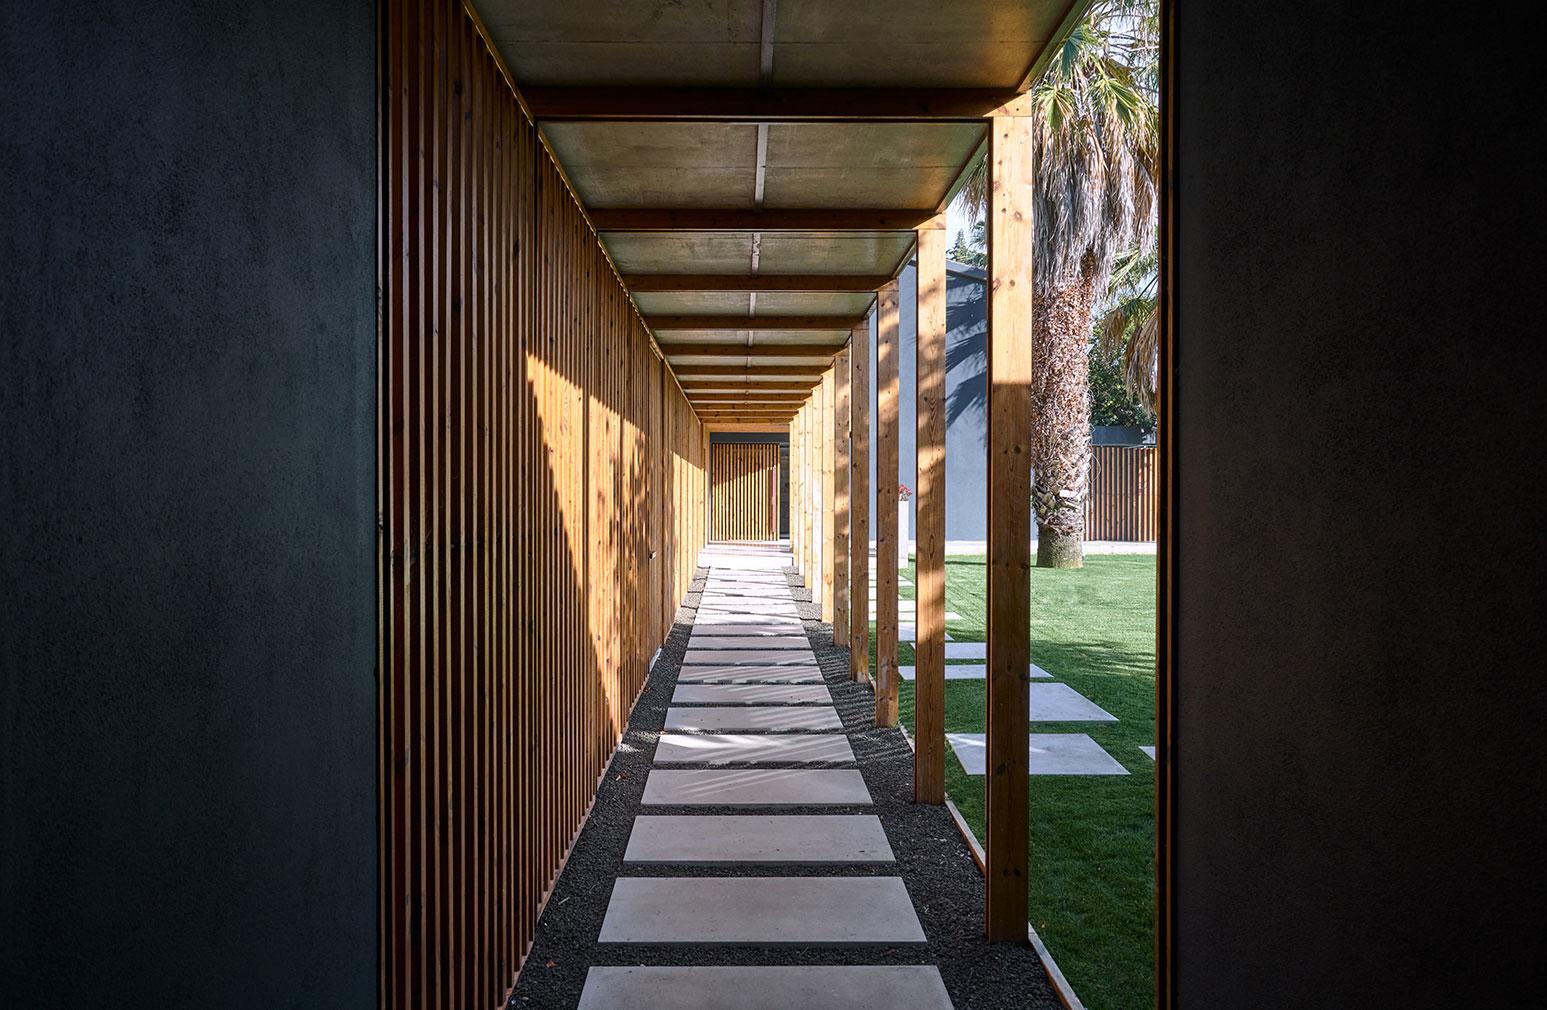 A Lisbon home designed by Portuguese architecture practice Atelier Data